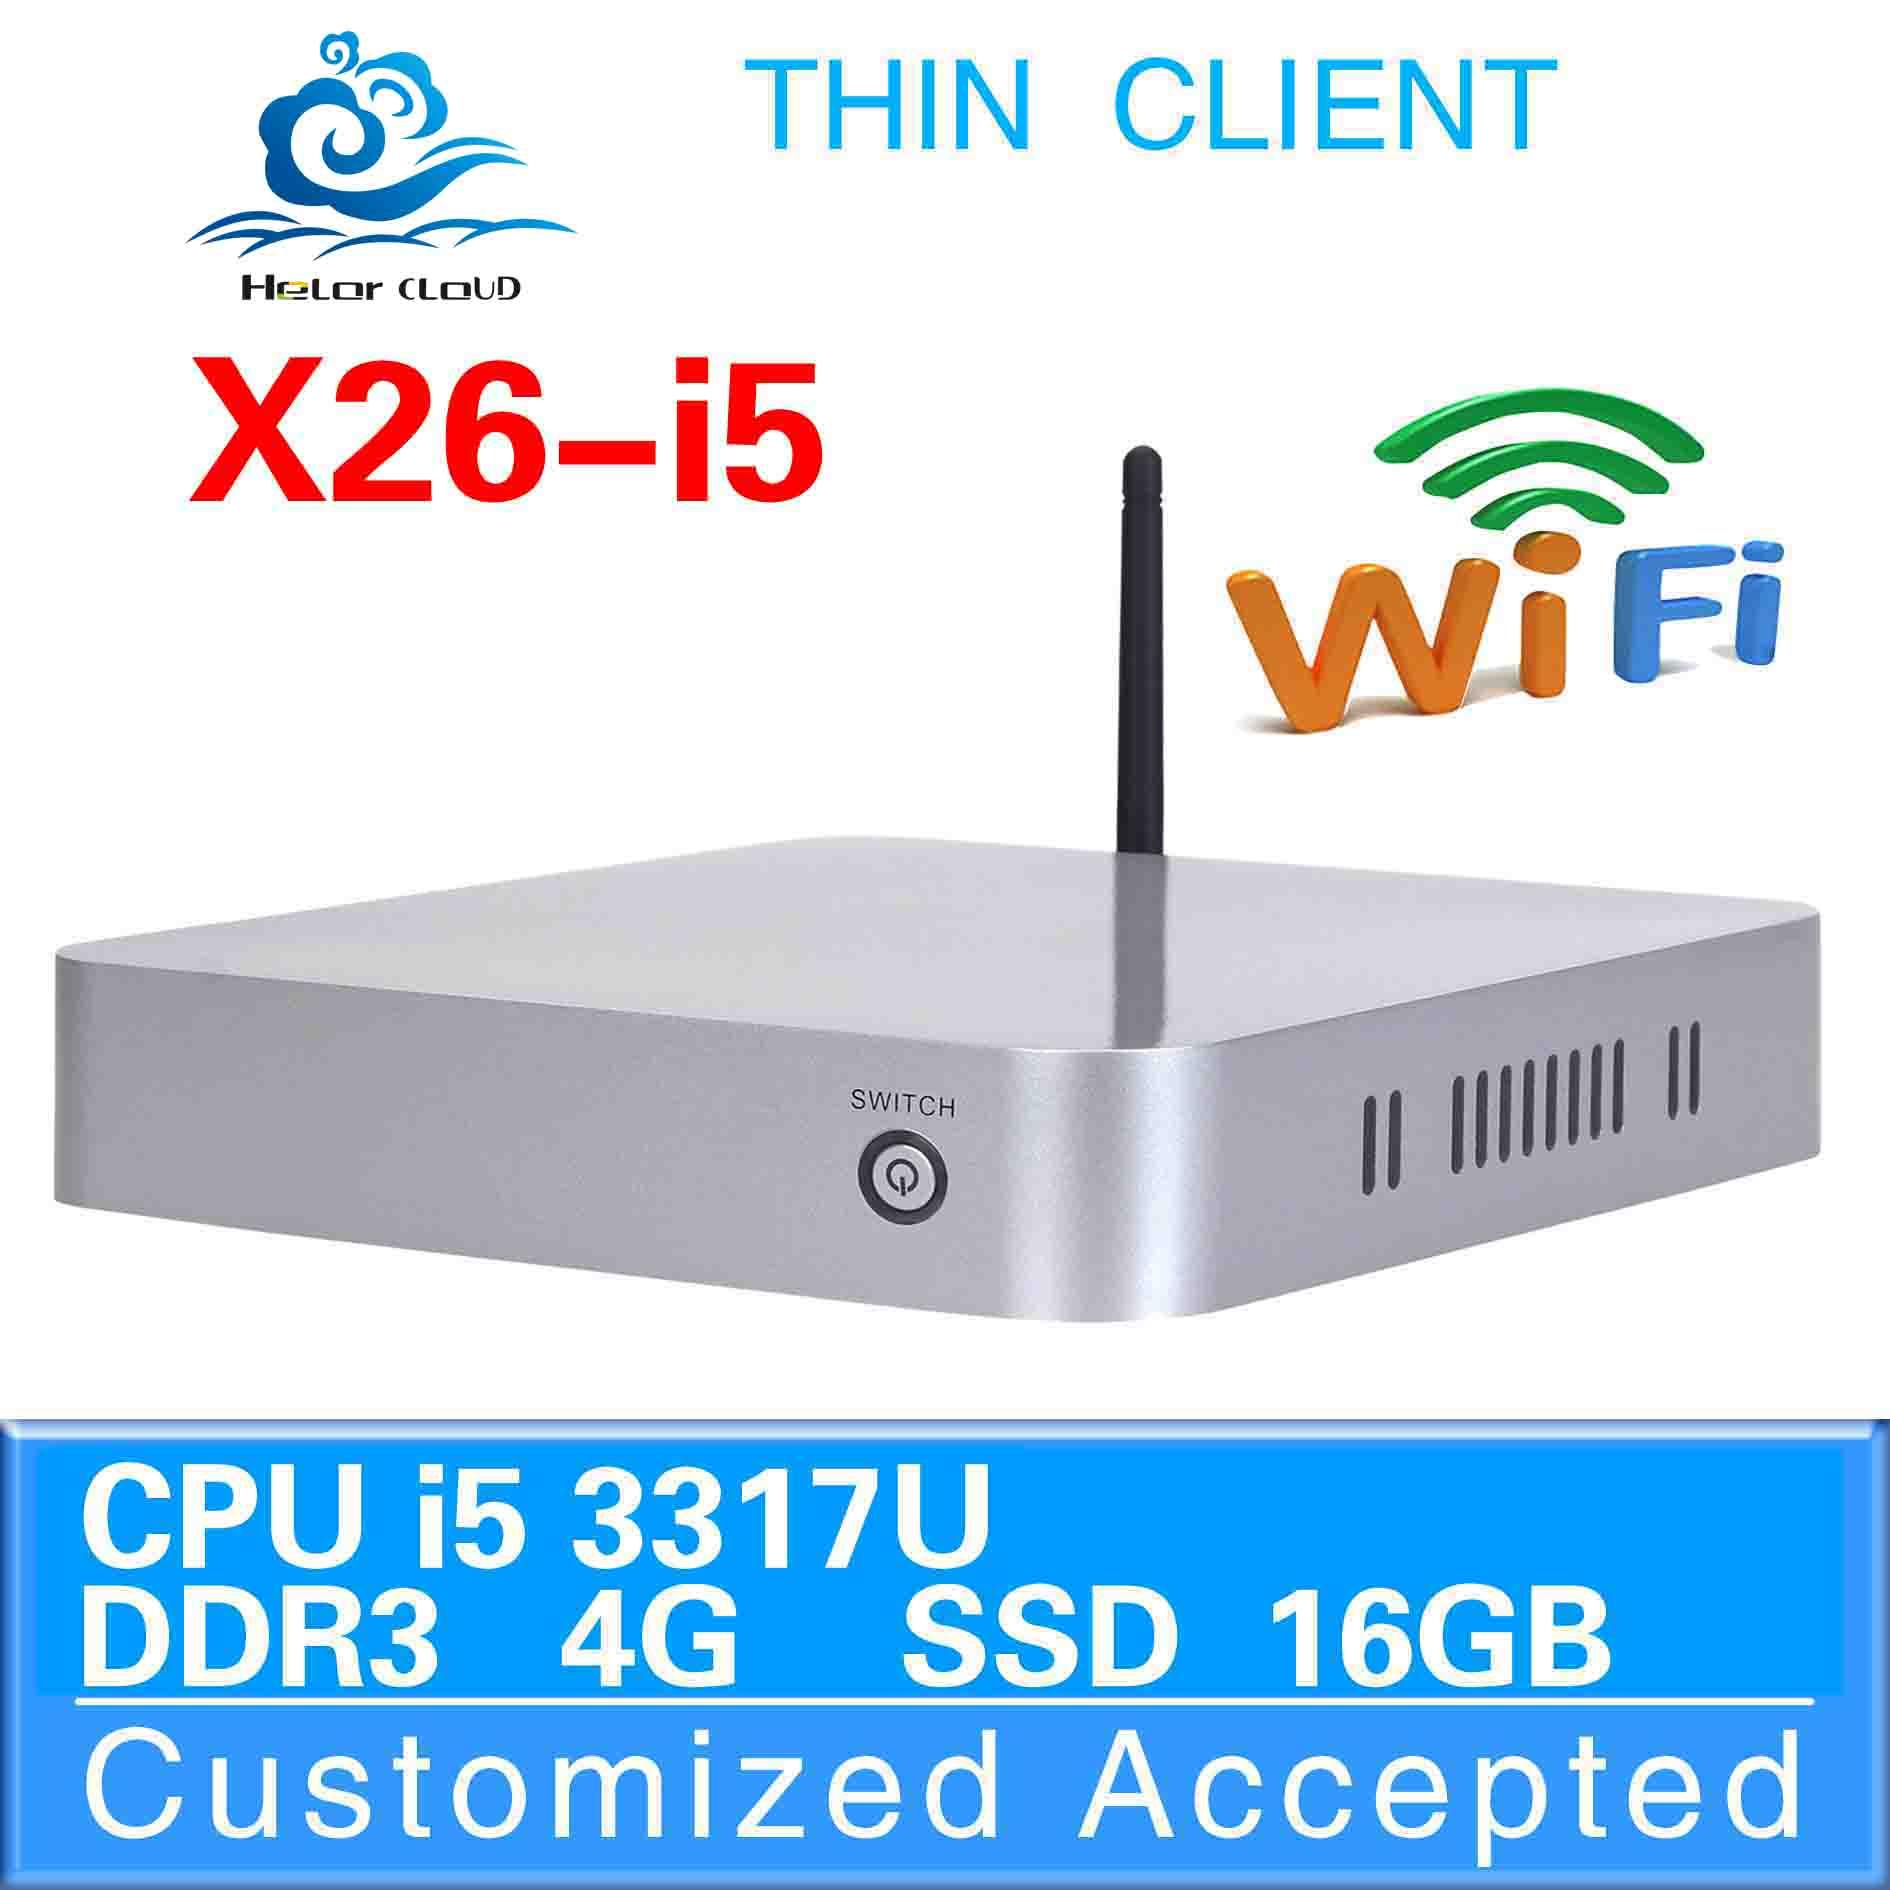 Joystick ,Pointing device factory desktop computer X26-I5 3317U 4G ram 16G ssd high performance 3D graphics(China (Mainland))